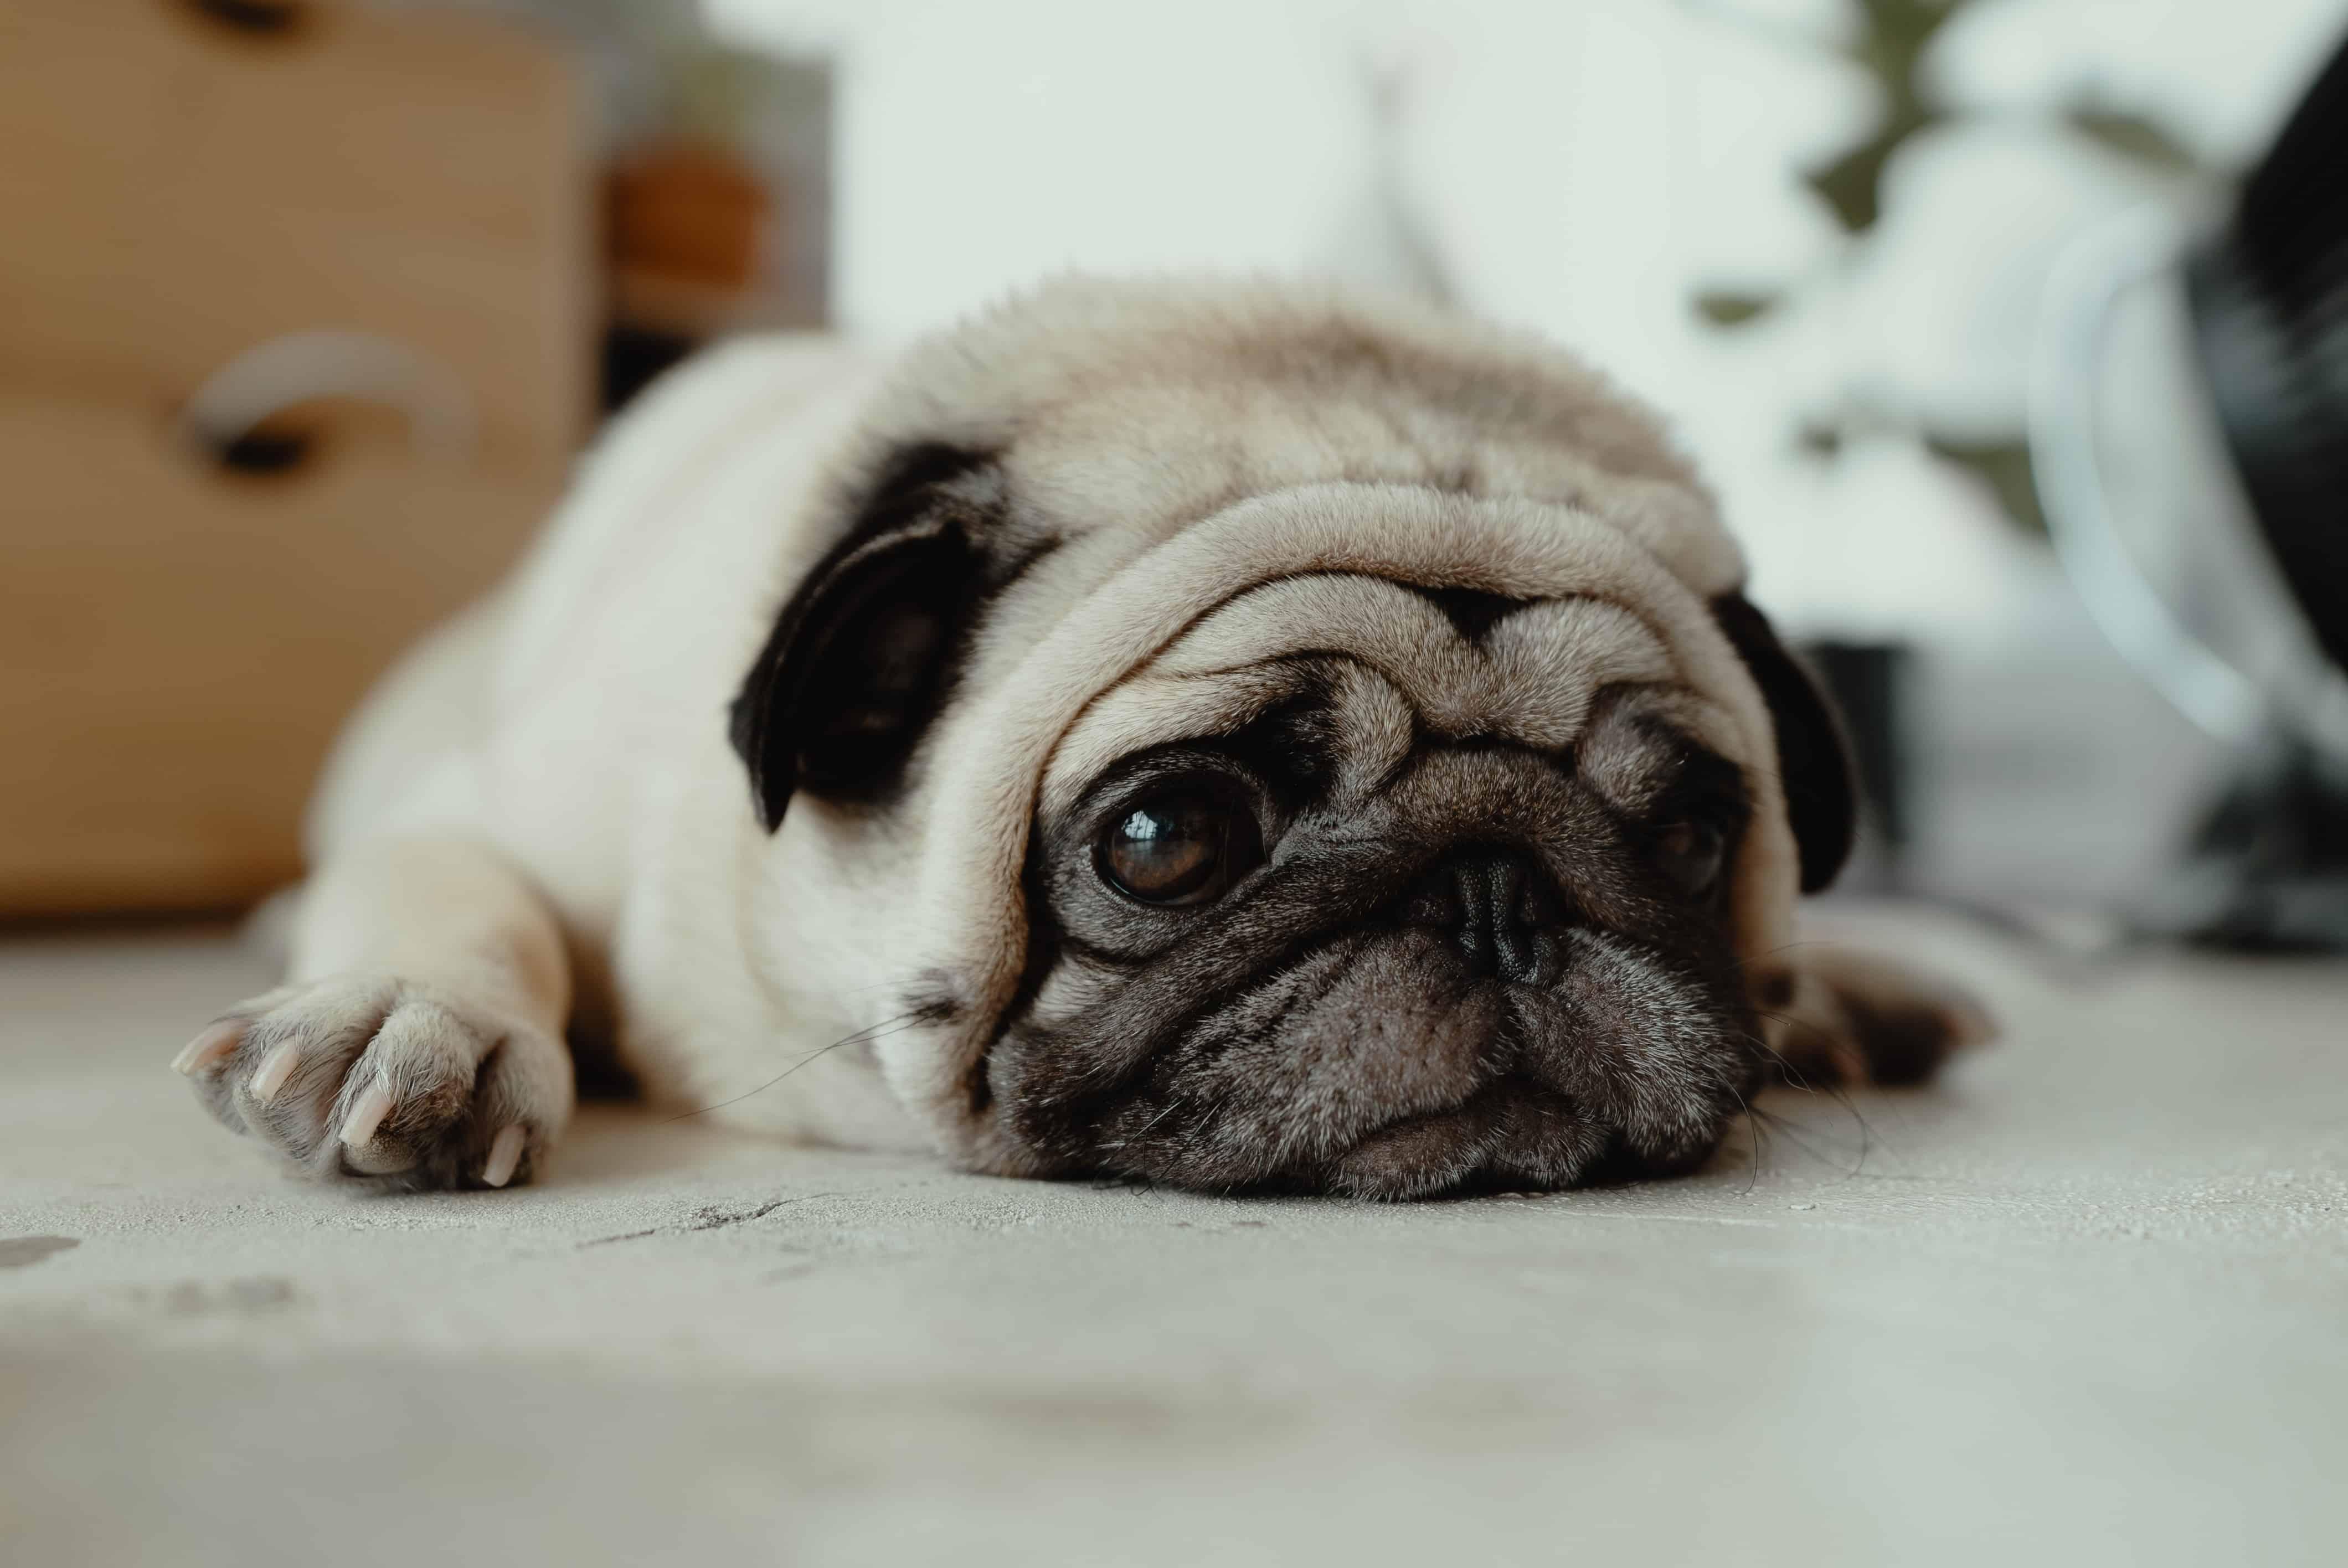 symptome-pollenallergie-hund